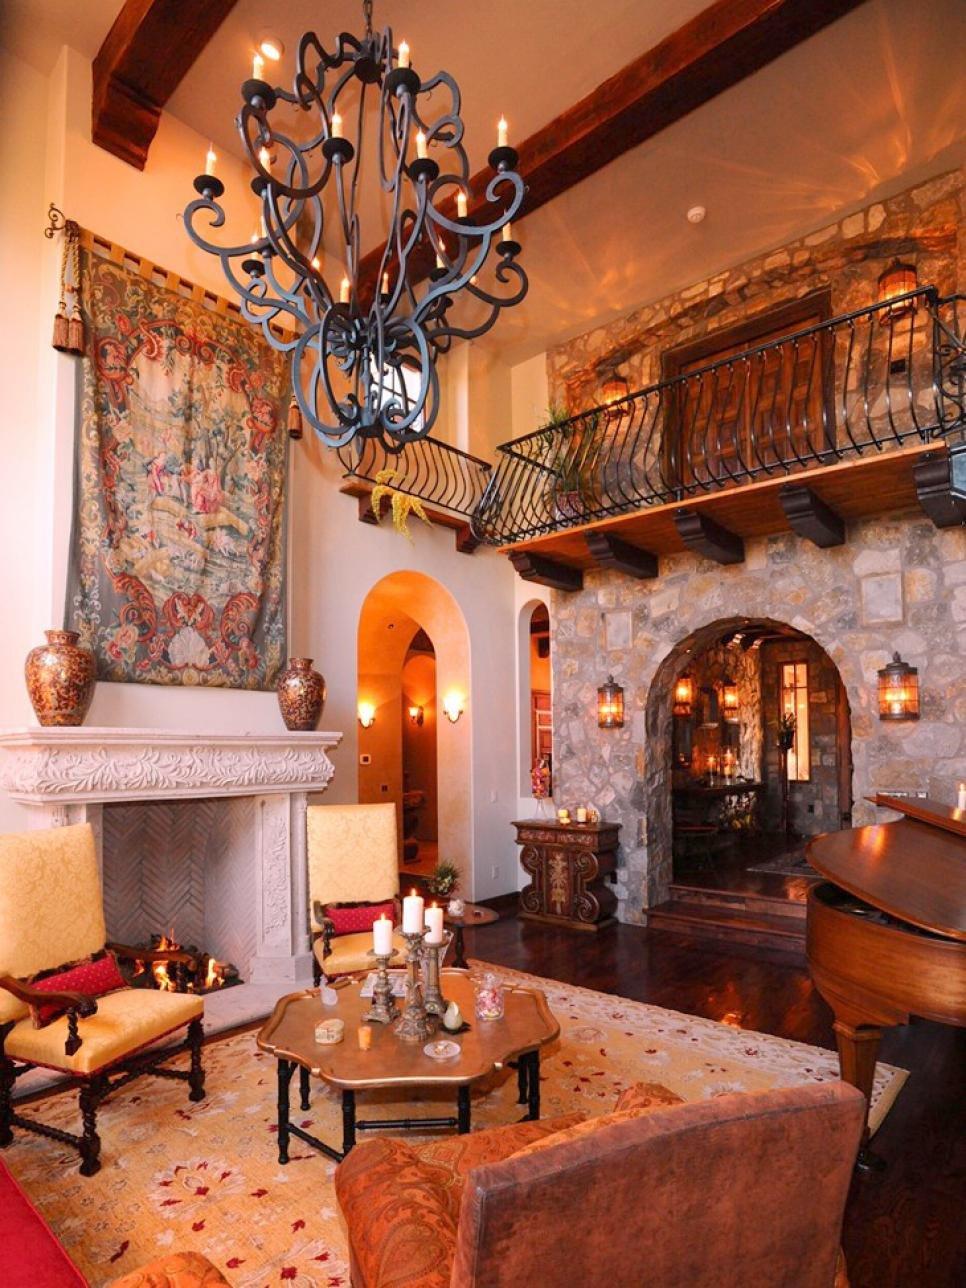 Spanish Style Home Decor Interior Unique Spanish Style Decorating Ideas